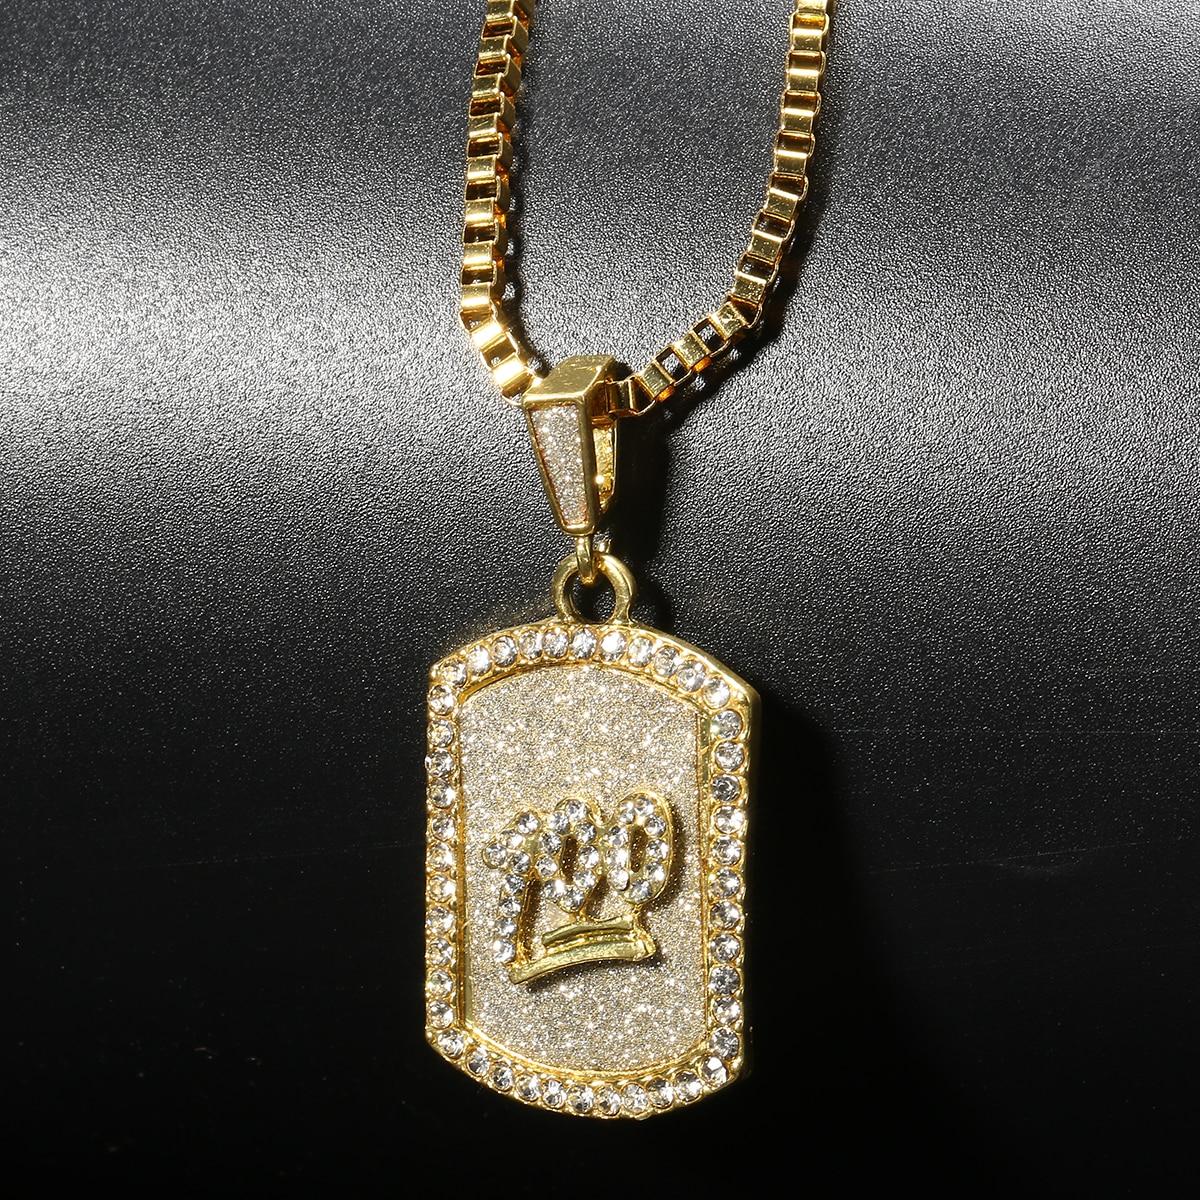 Yinplsmemory Cremation Urn Necklace for Ashes Memorial Gift UFO Shape Urn Locket Pendant for Women Men